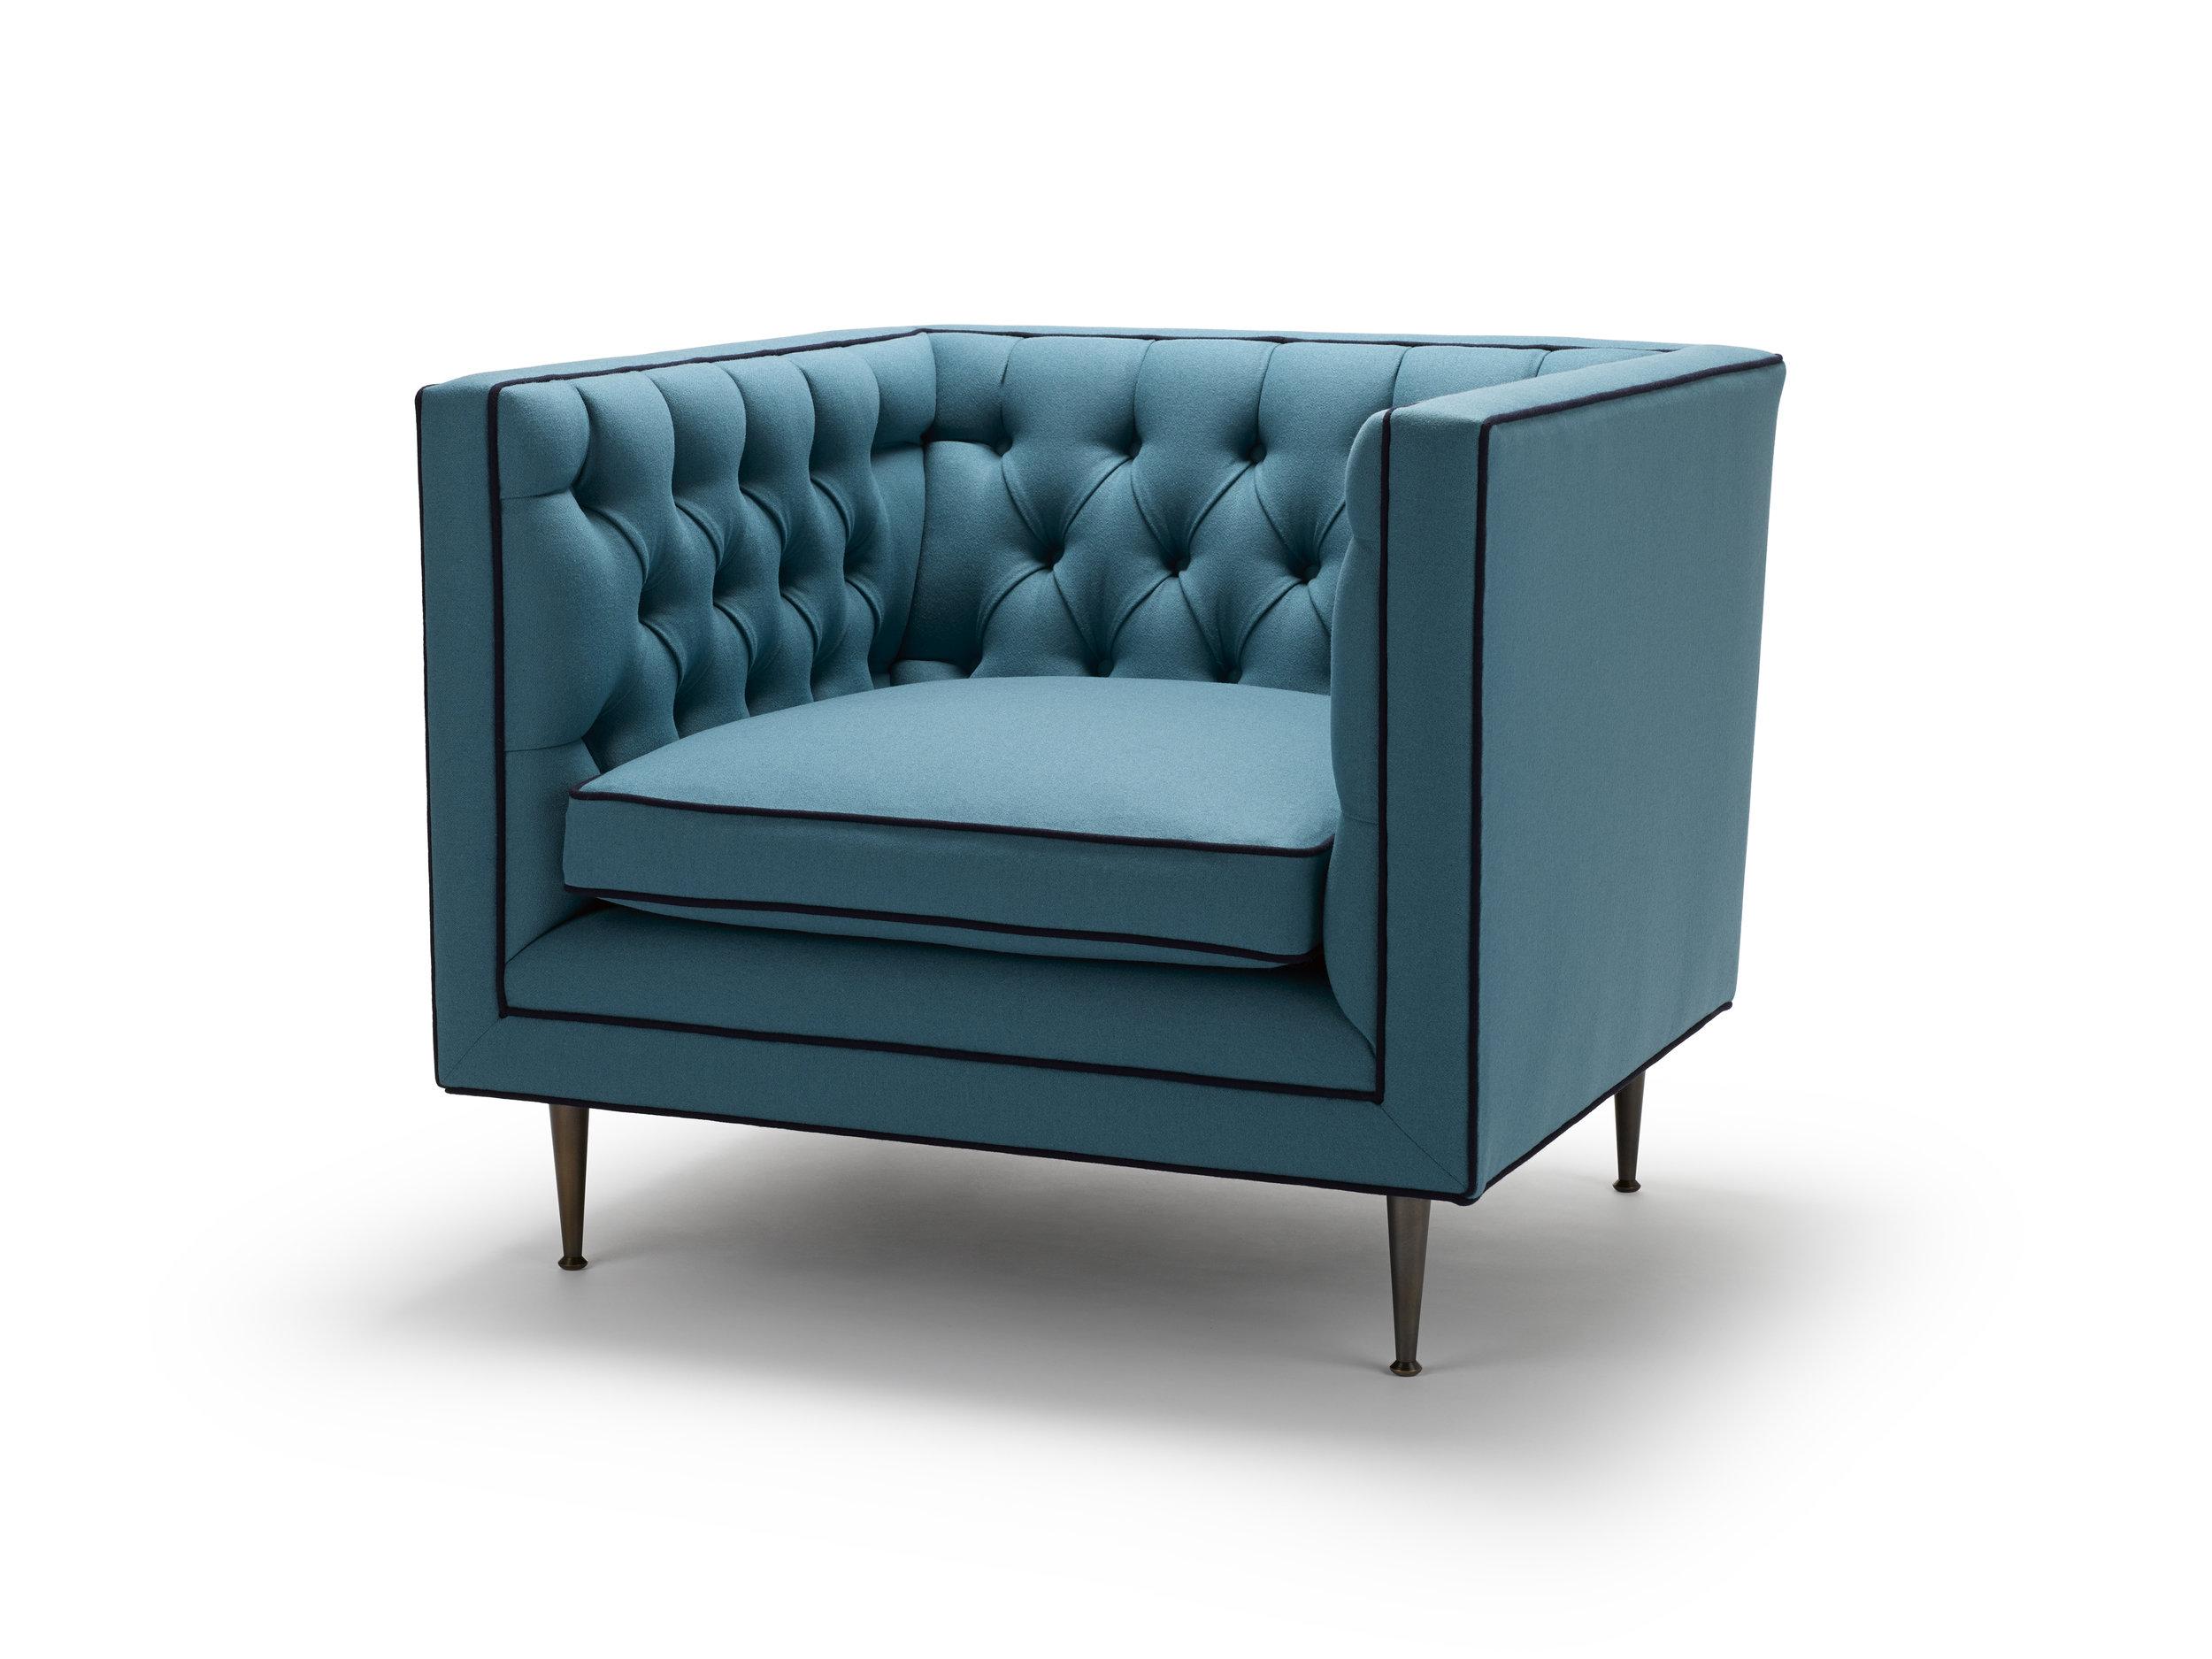 2015-3-12 Tux Lux Chair -Jade3633_8bit v2.jpg